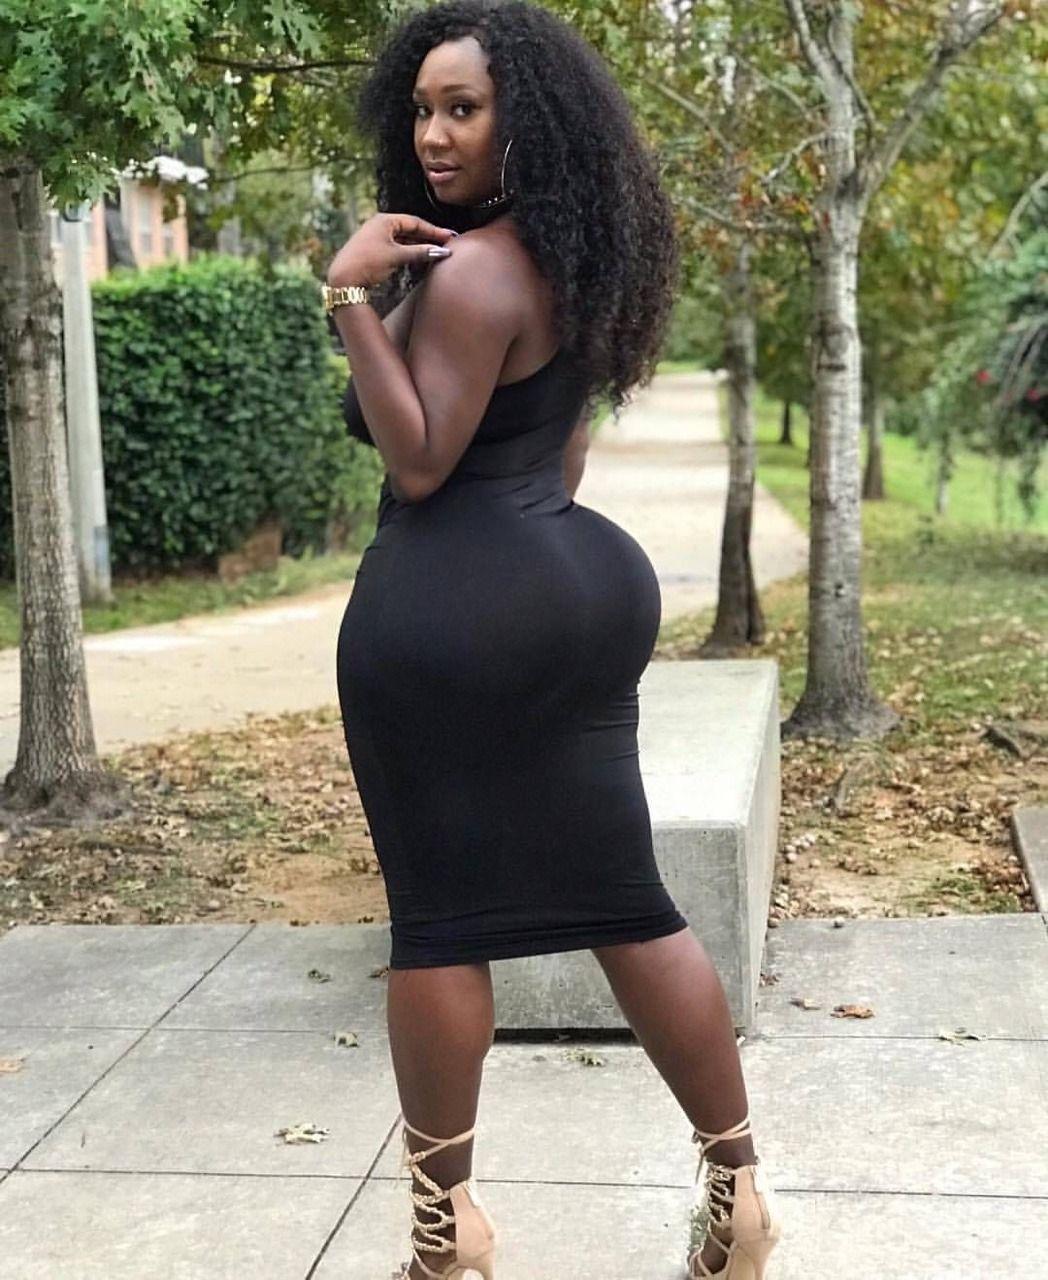 dunkeychunks : photo | sexy female | pinterest | black and woman